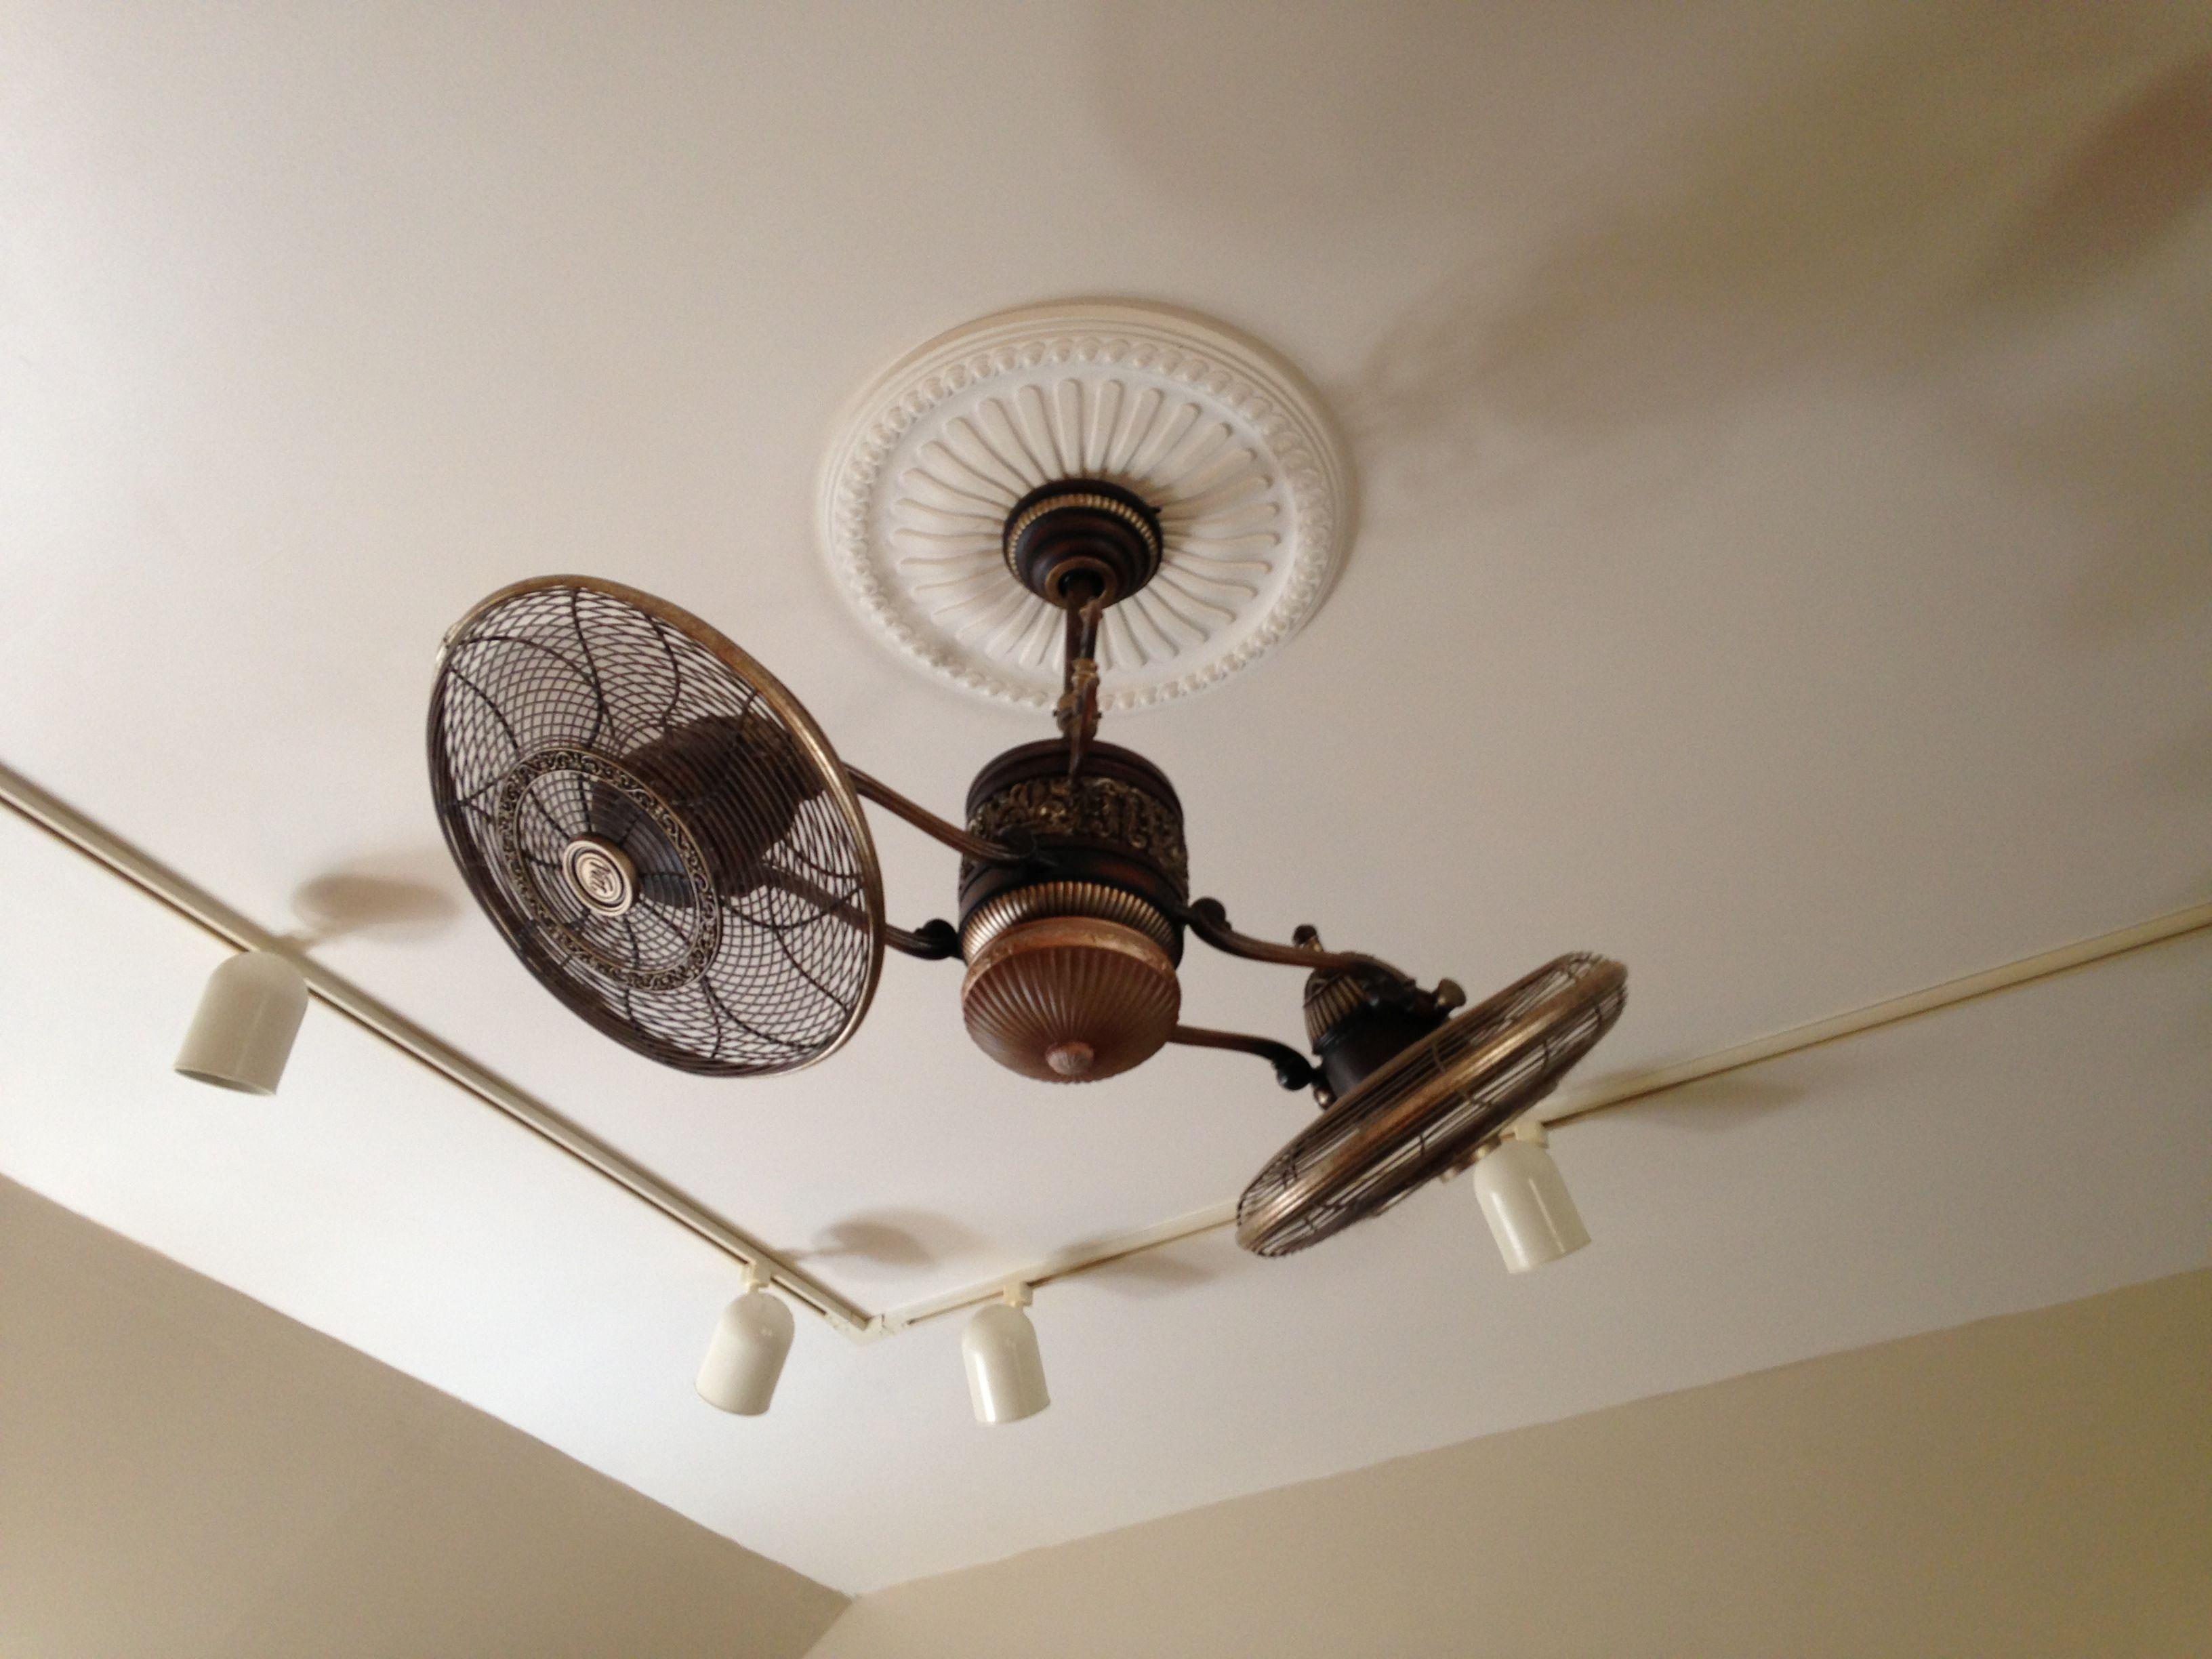 cool old school ceiling fan idea bar ideas pinterest ceiling fan ceilings and house. Black Bedroom Furniture Sets. Home Design Ideas